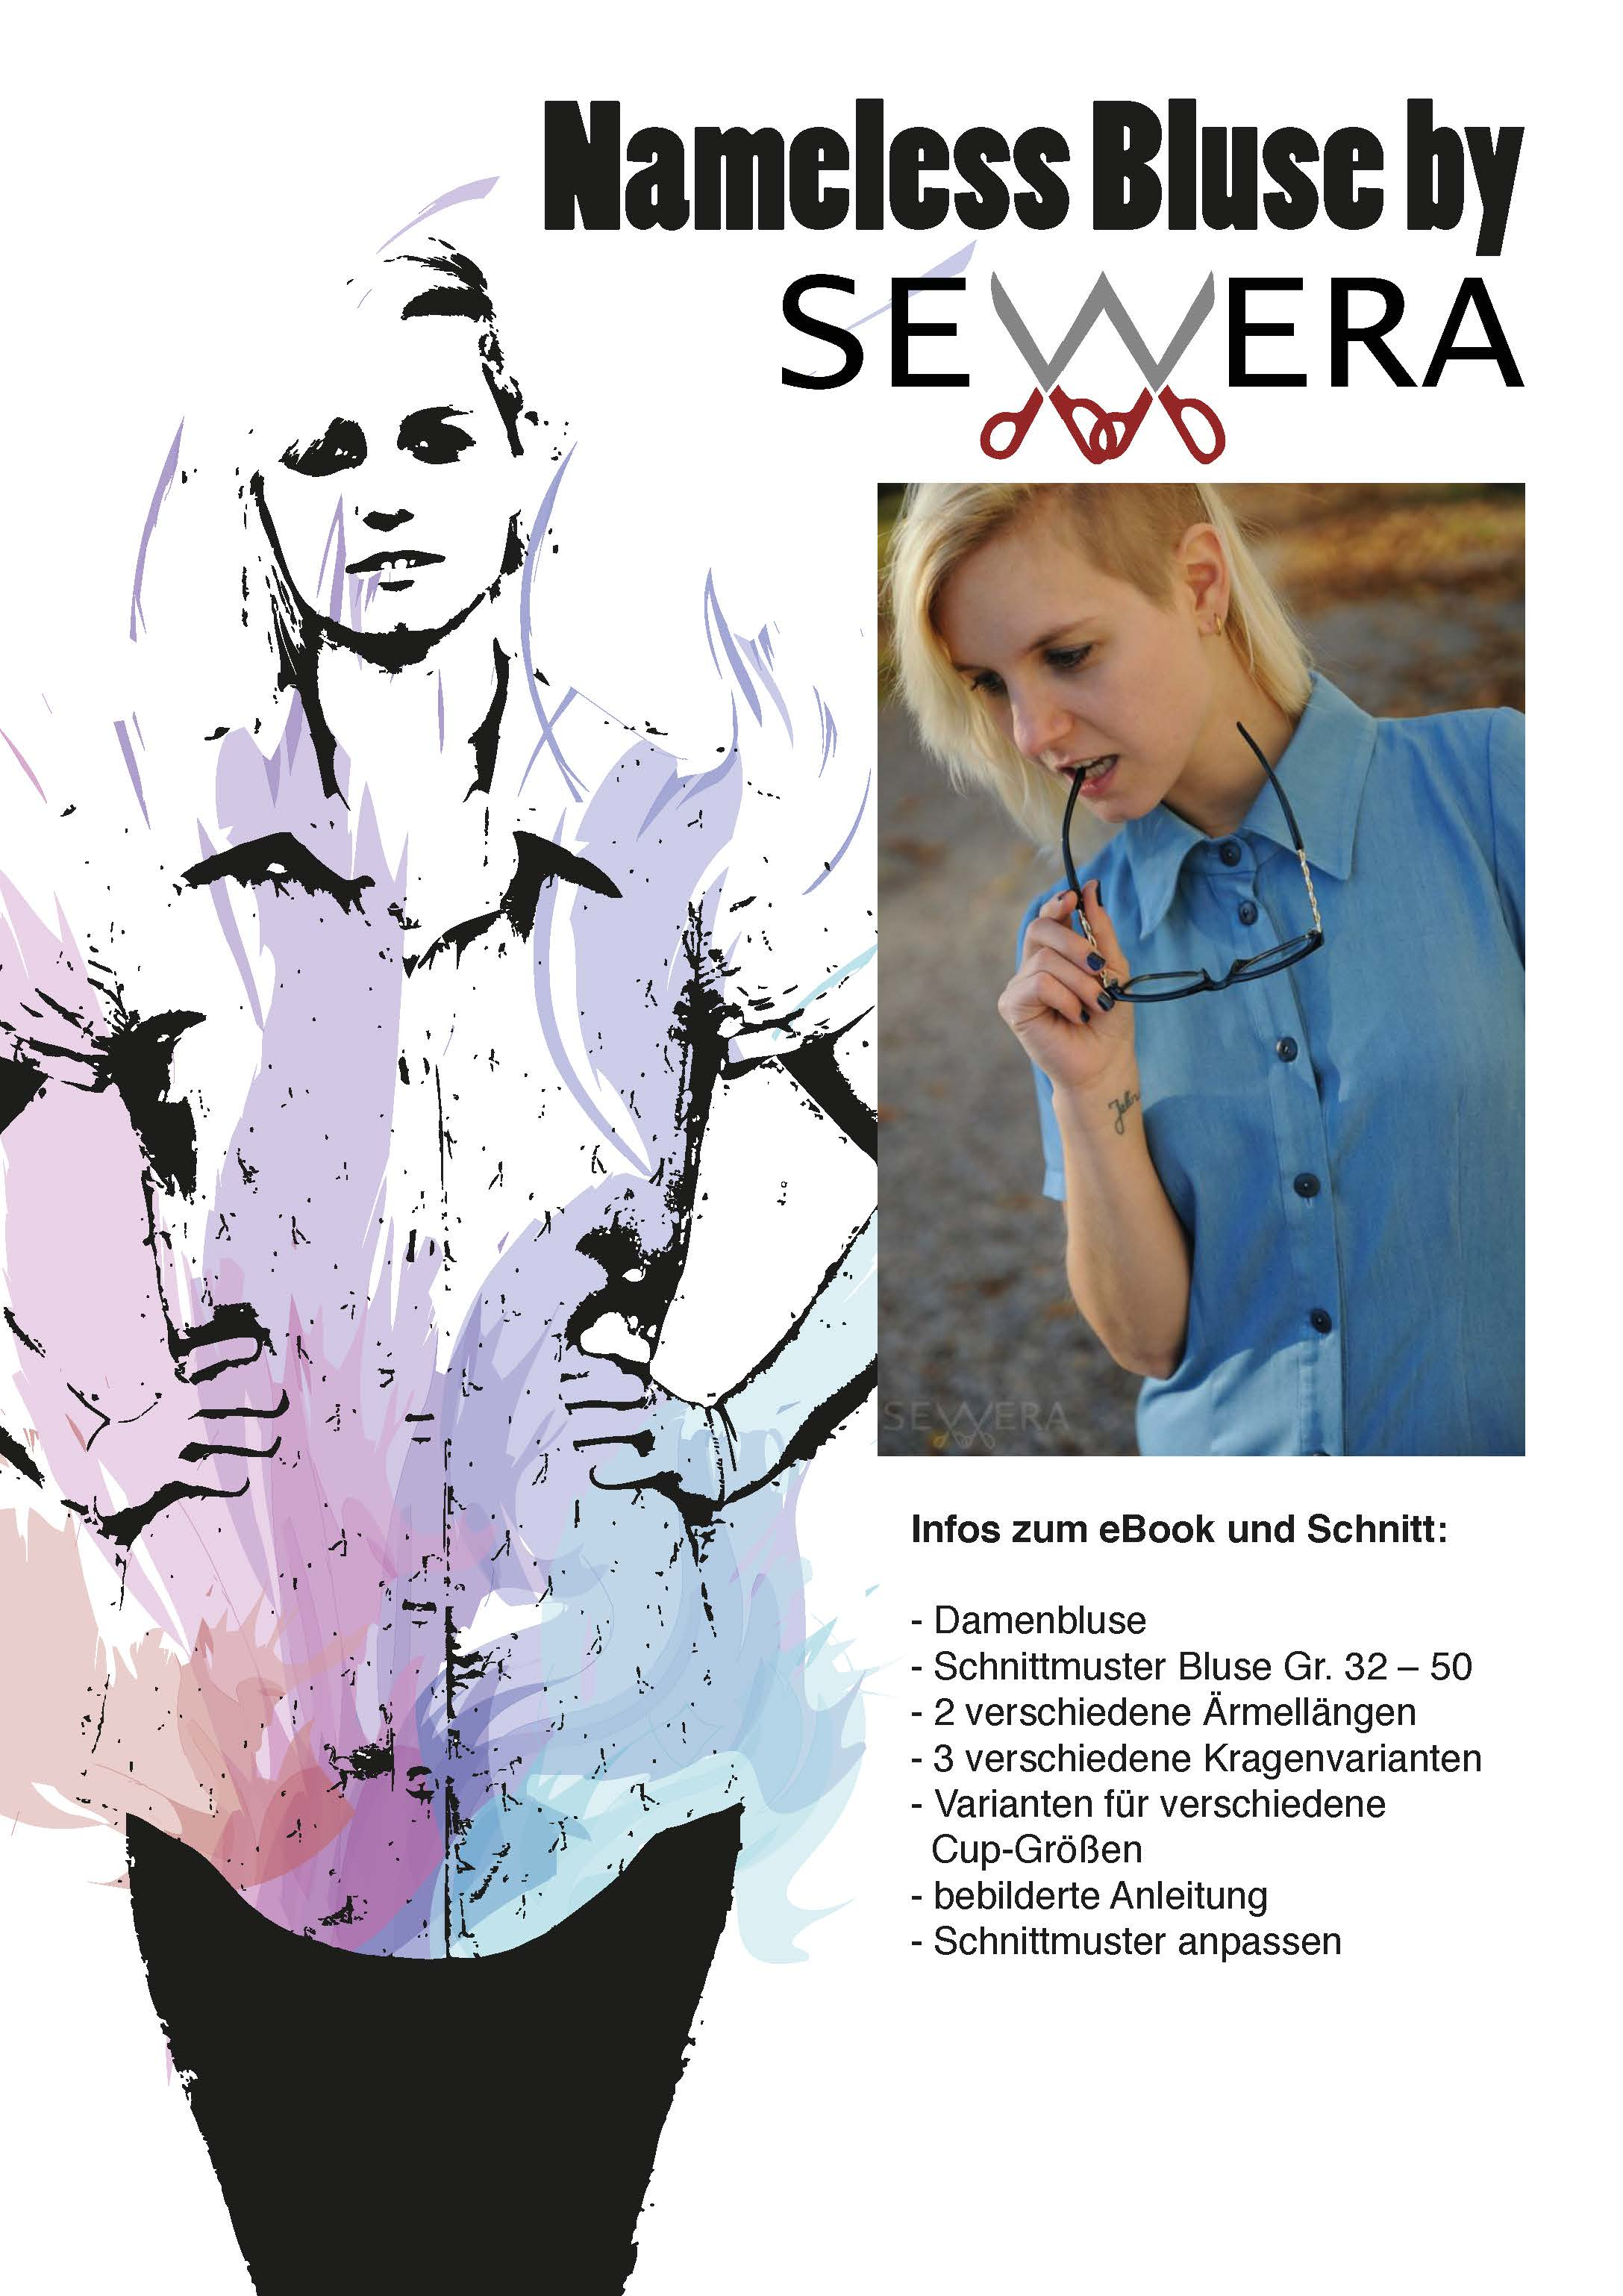 Nameless Bluse Schnittmuster und Anleitung by Sewera - Sewera Fashion